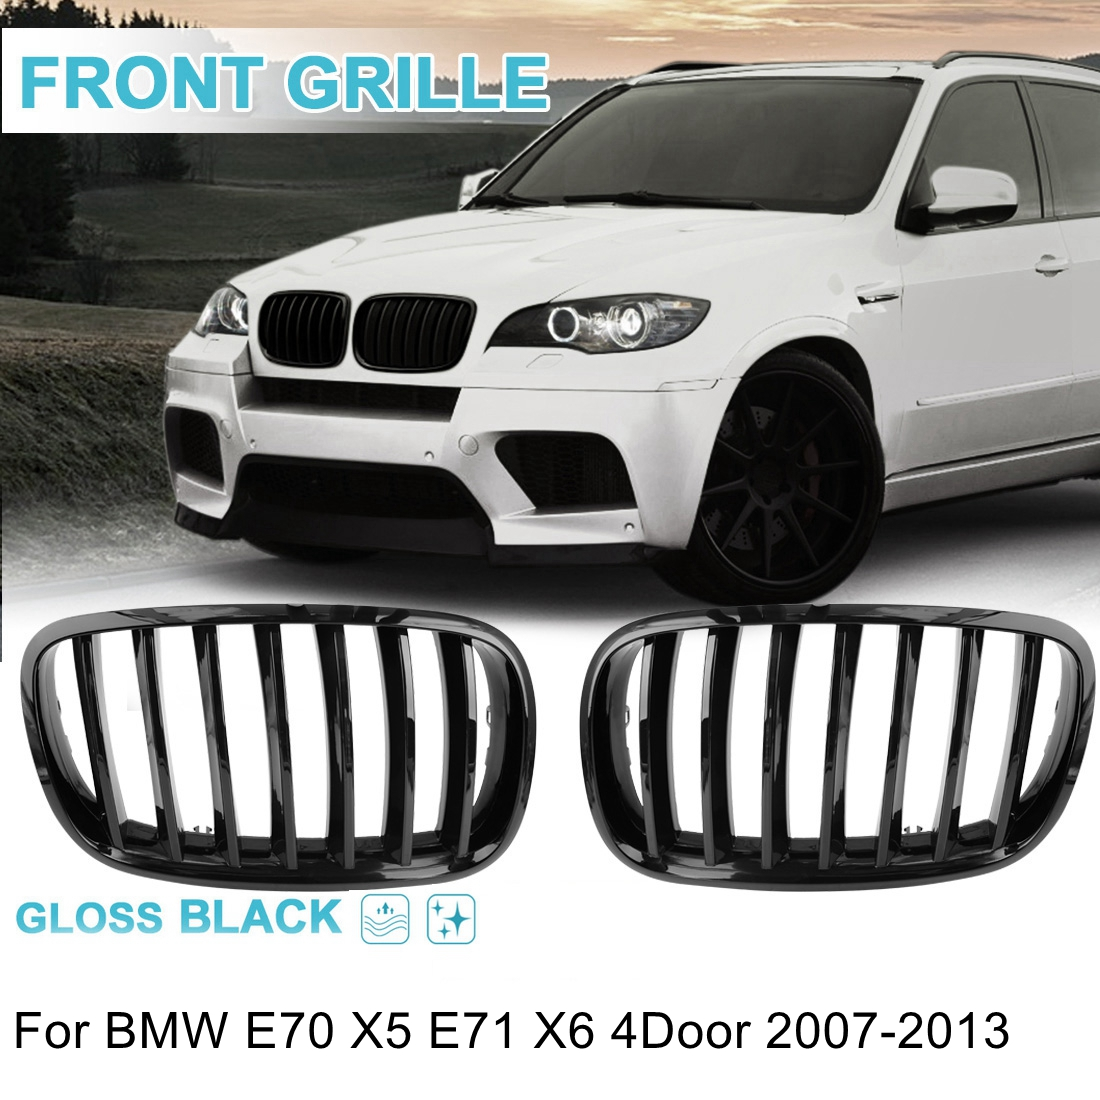 UXCELL 2PCS Frente Gloss Black Dupla Slat Bumper Rim Grille Grill Para BMW E70 X5 E71 X6 E46 E90 série 5 F30 F10 1997-2016